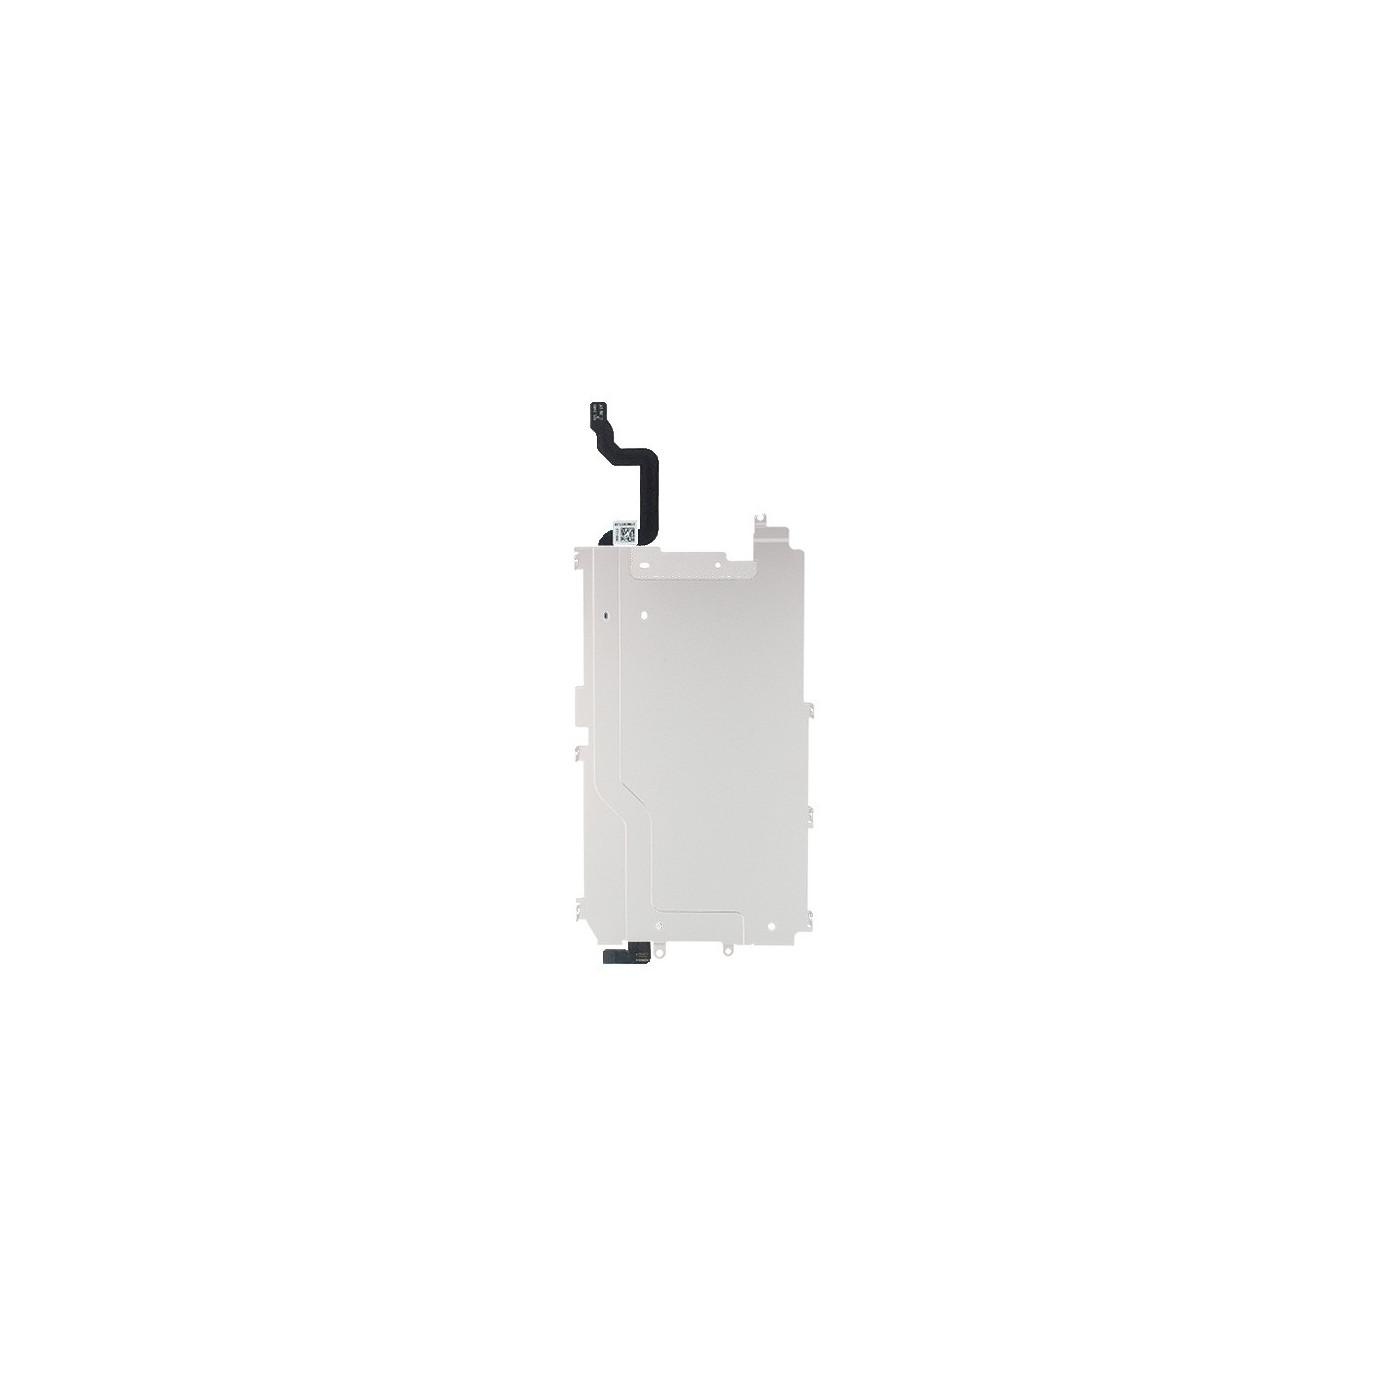 Marco trasero de metal lcd para Iphone 6 con cable de botón de inicio